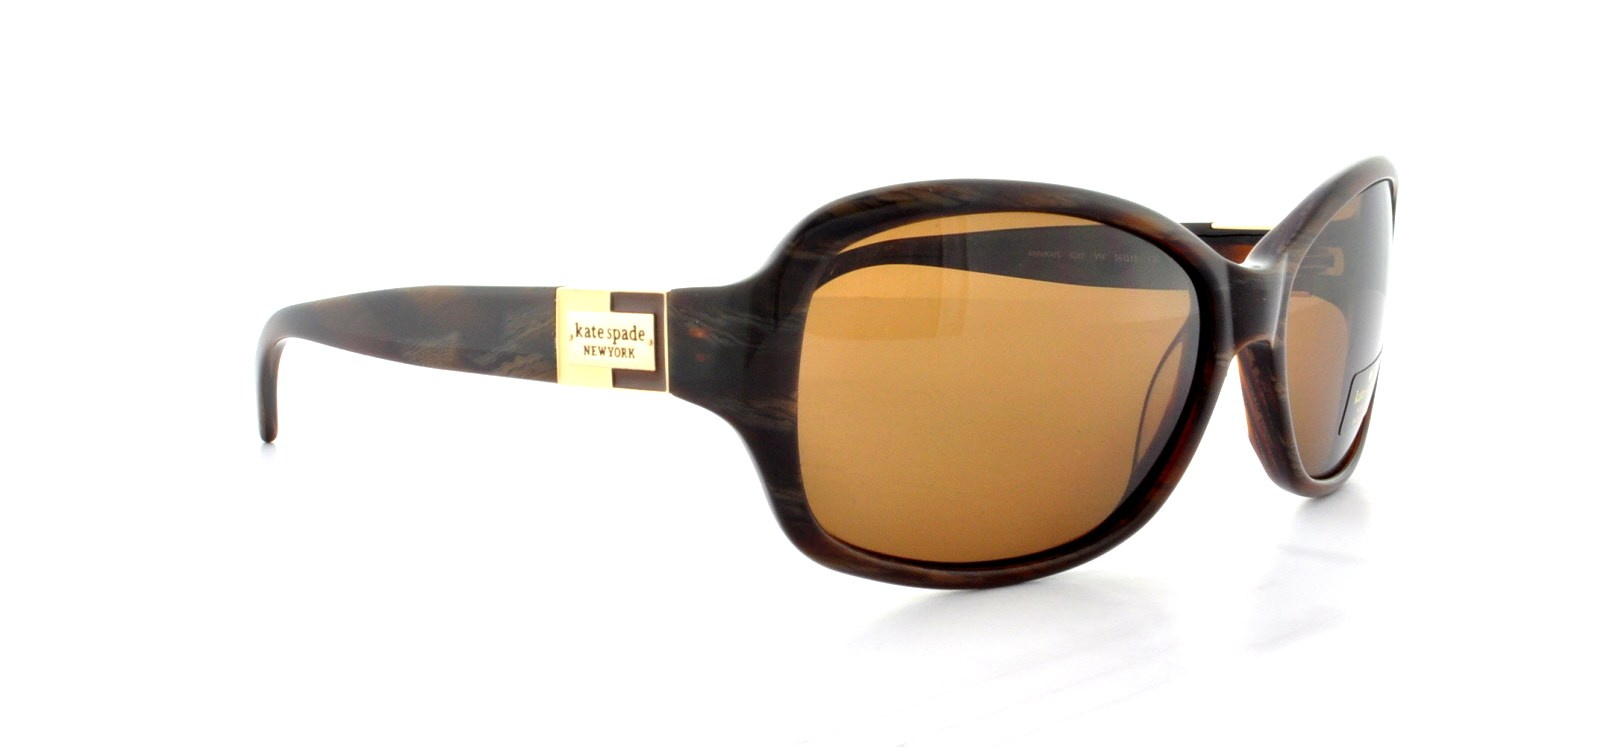 b0d555f20d KATE SPADE - KATE SPADE Sunglasses ANNIKA S 1Q8P Brown Horn 56MM -  Walmart.com